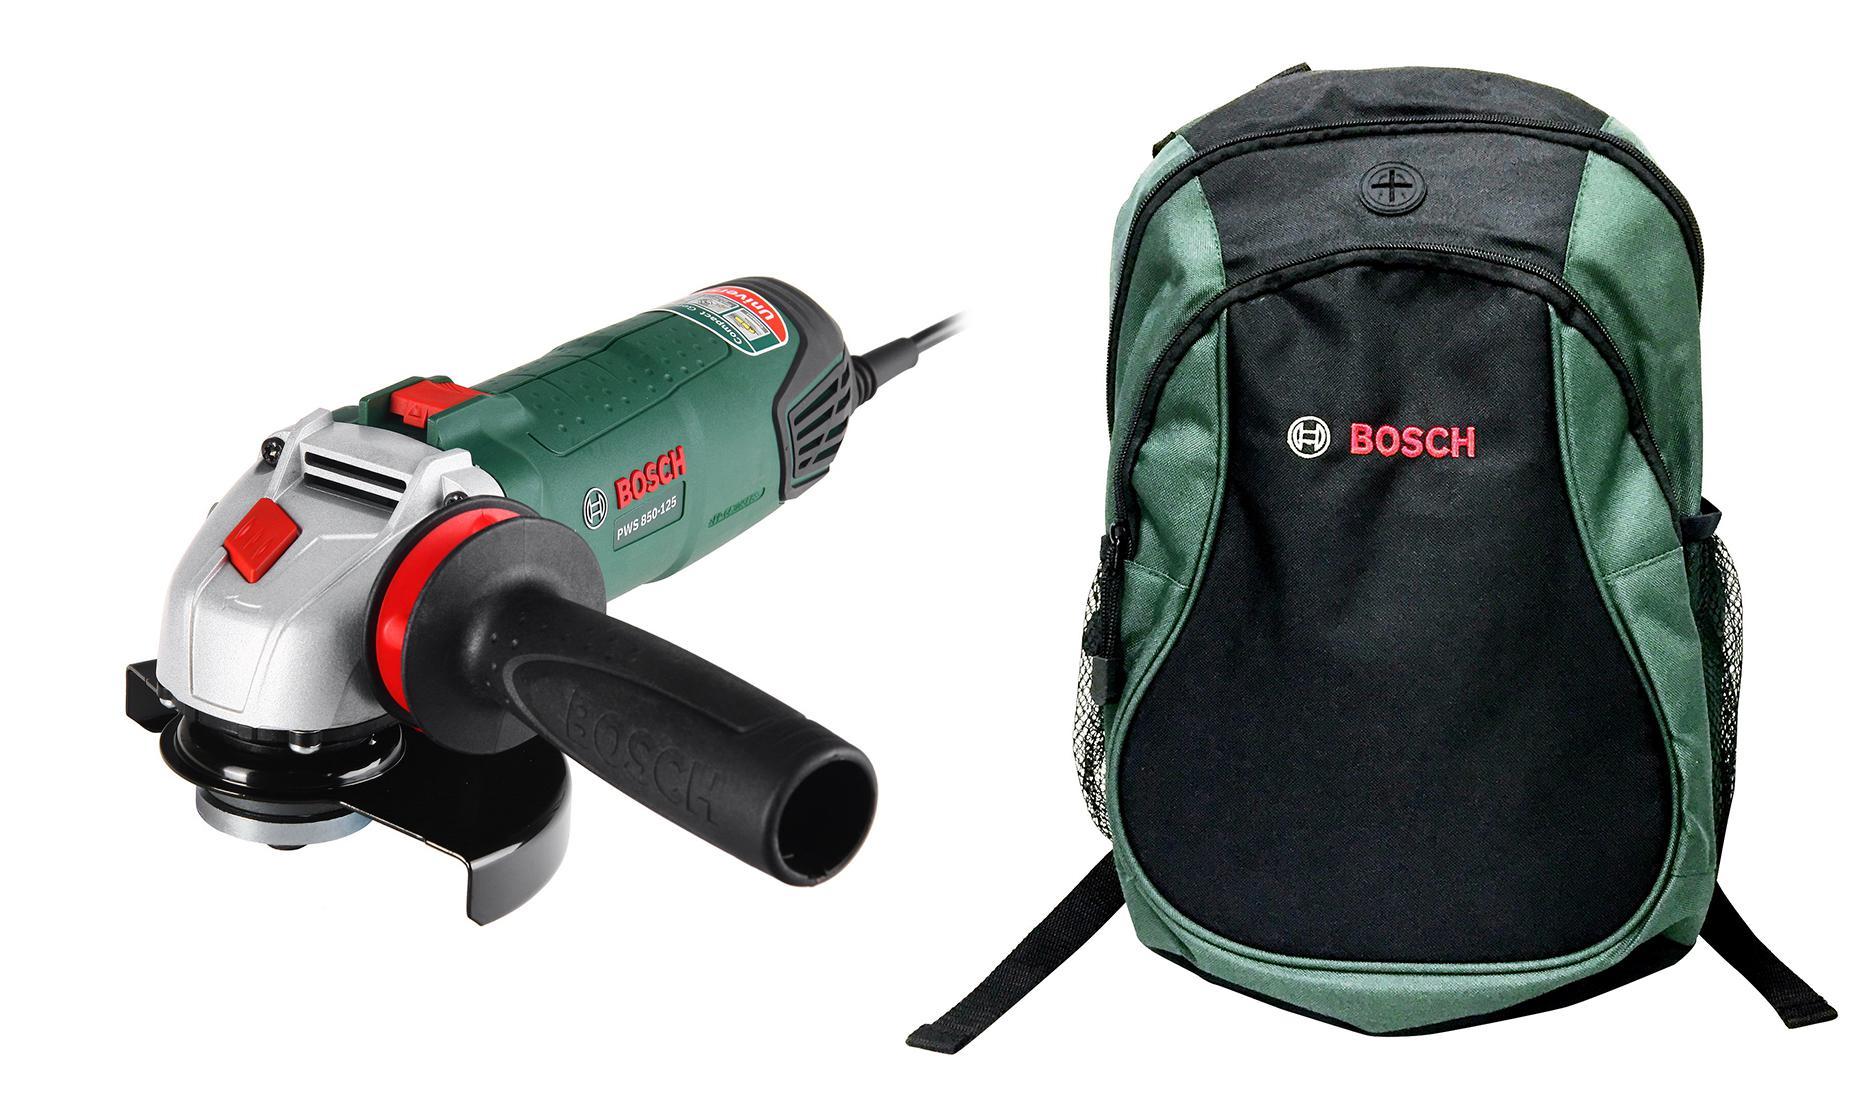 Набор Bosch УШМ (болгарка) pws 850-125 (0.603.3a2.720) +Рюкзак green (1619g45200) болгарка bosch pws 850 125